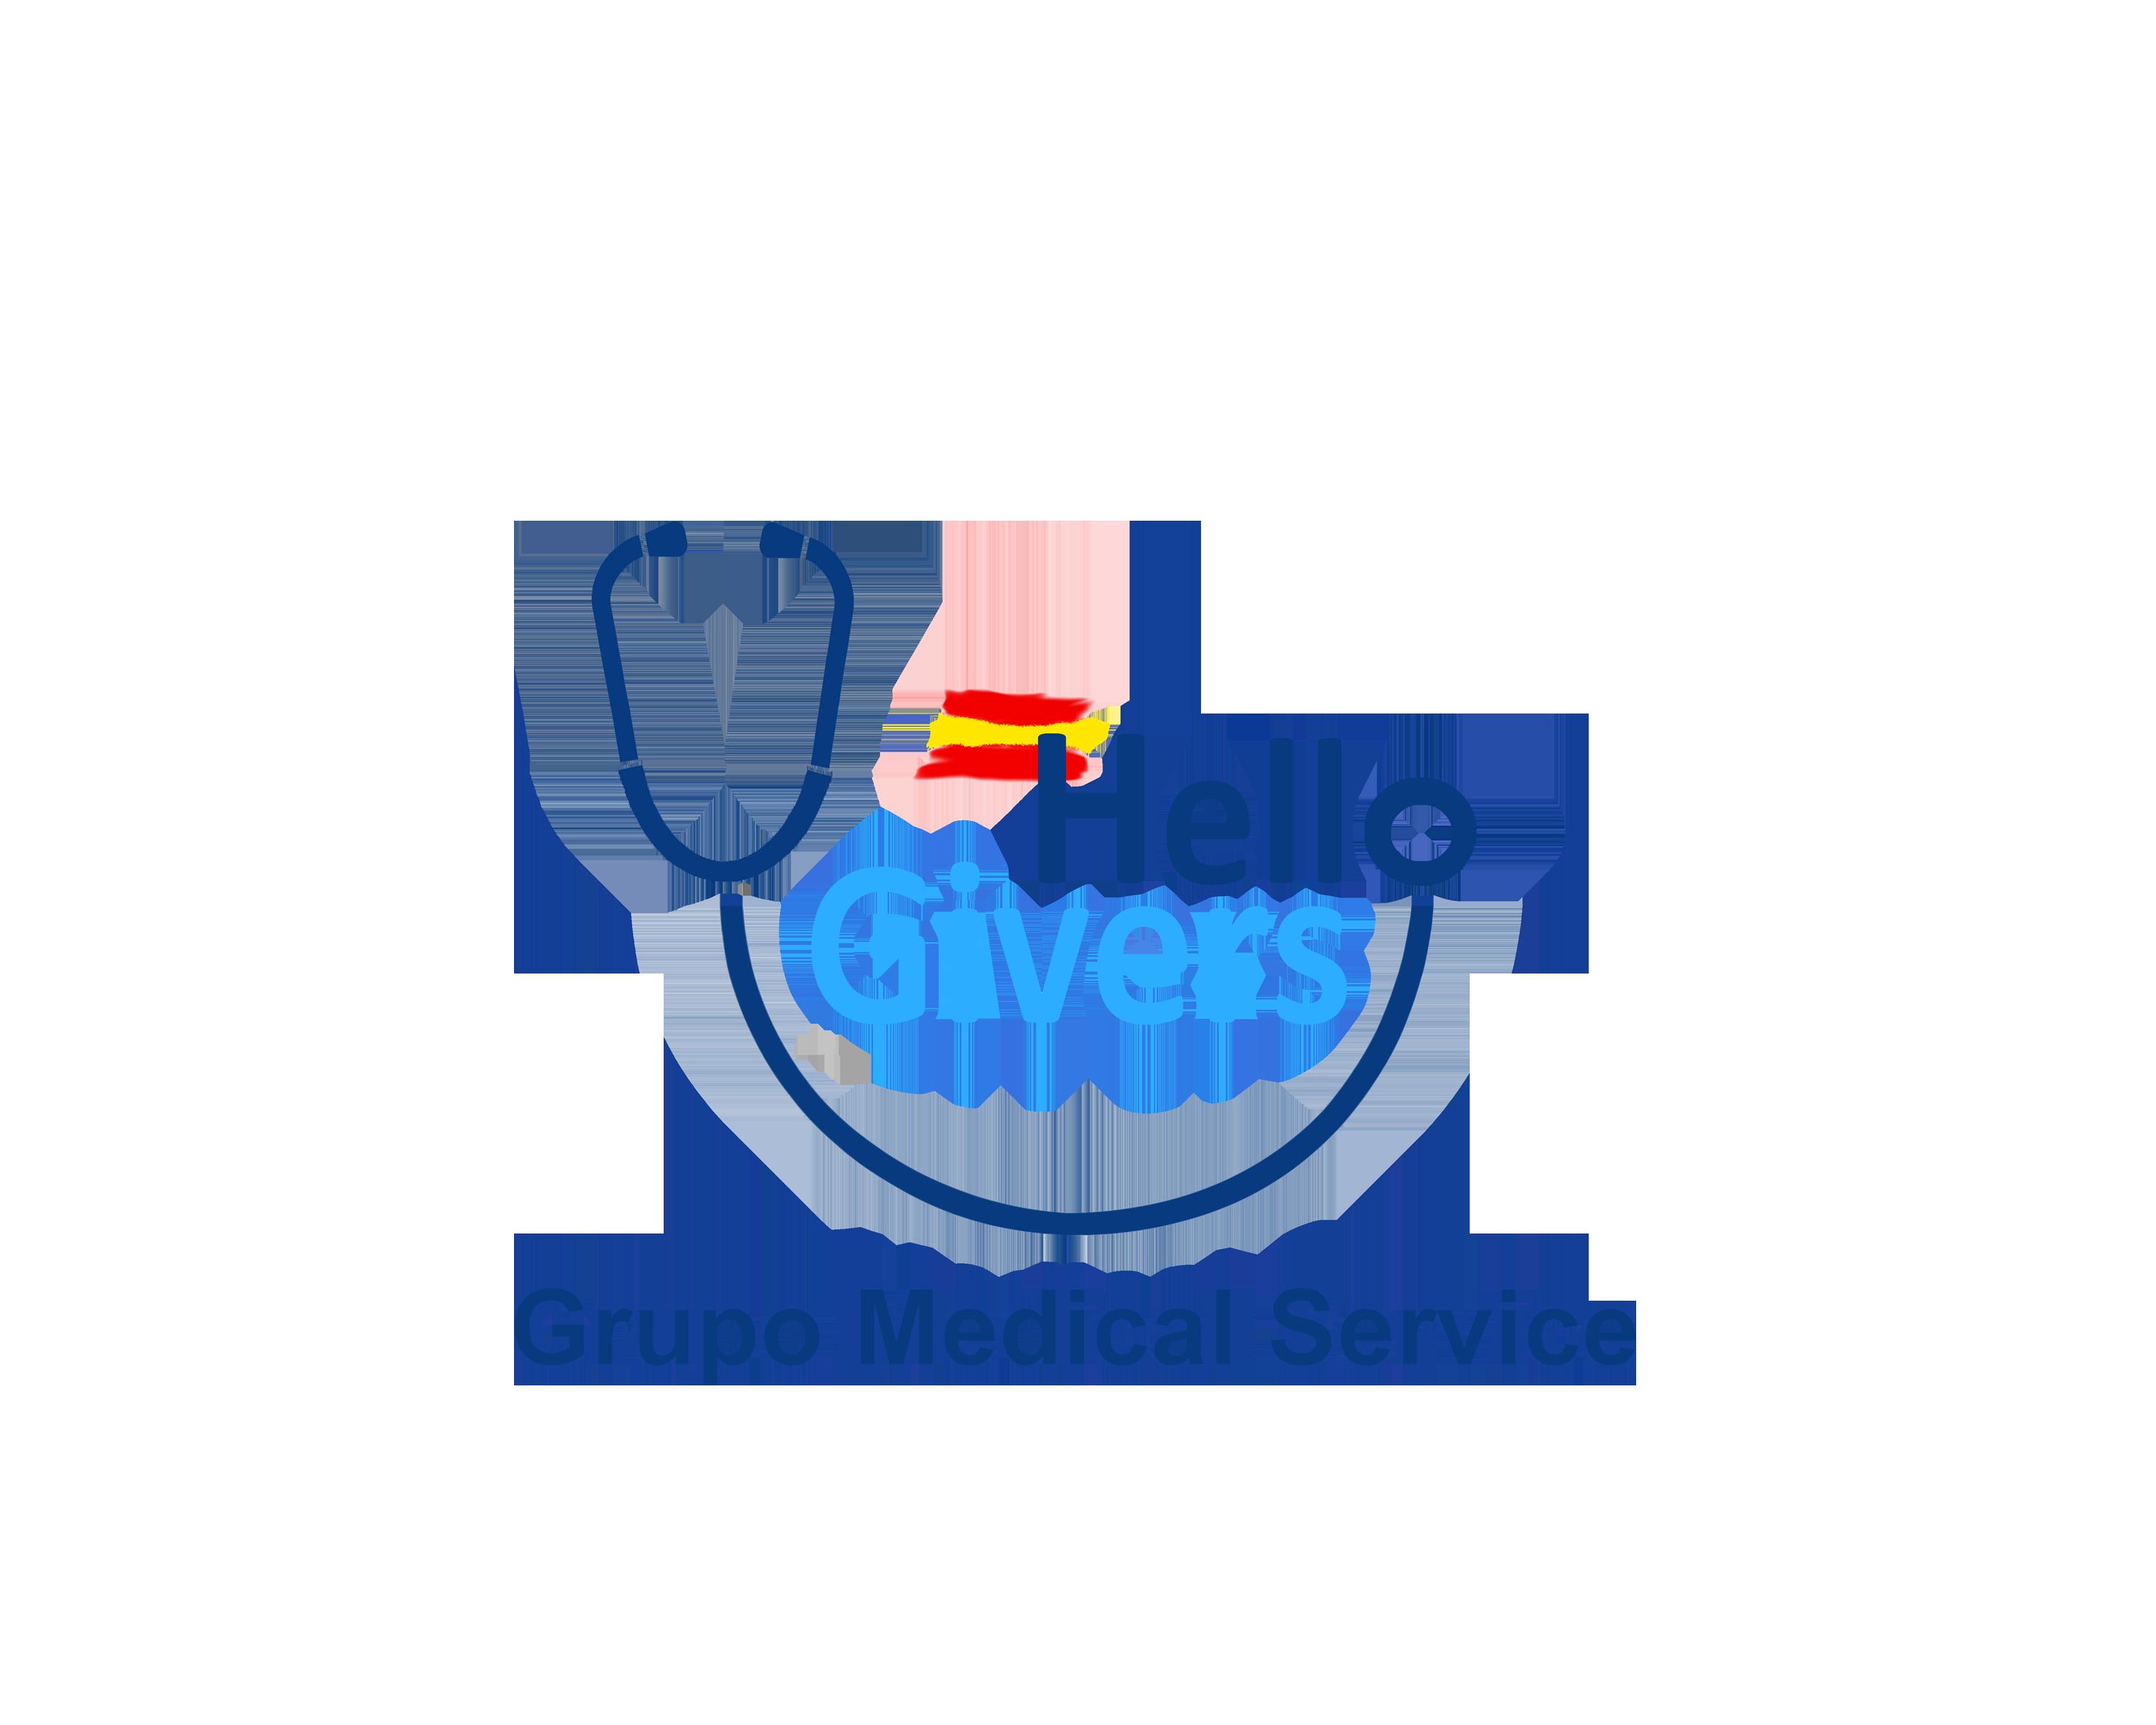 HelloGivers